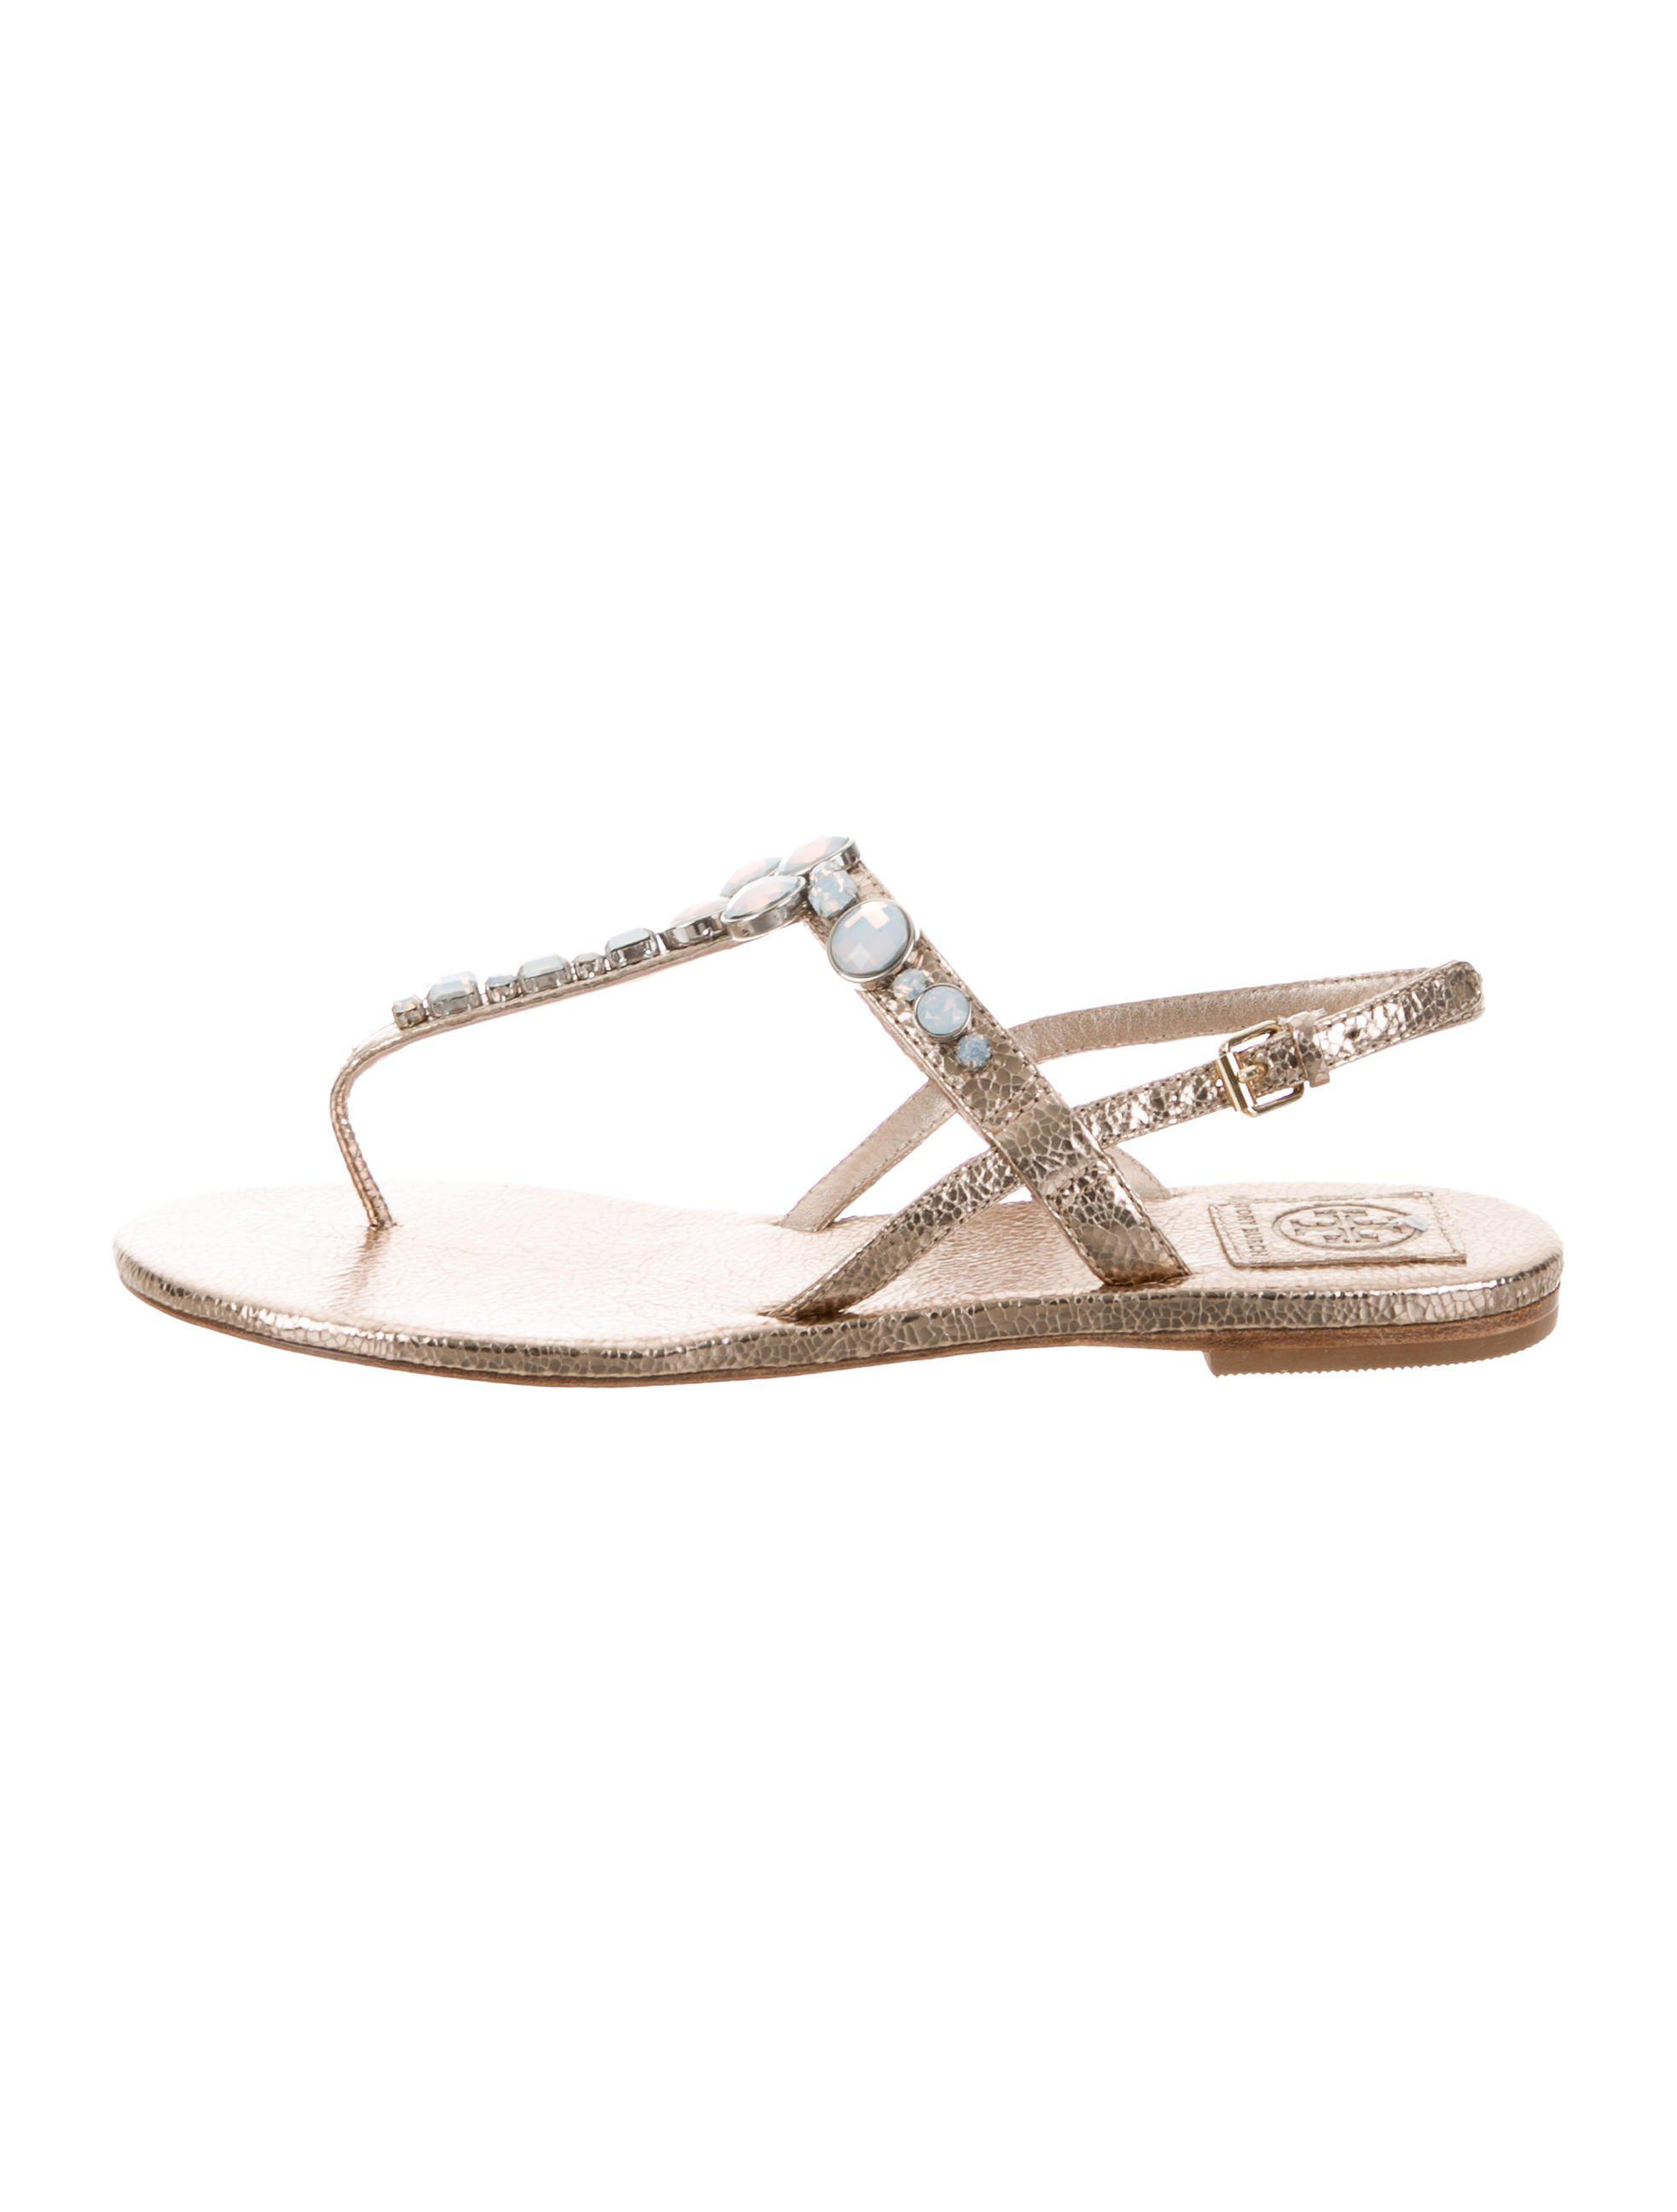 f2d458231d80 Lyst - Tory Burch Adalynn Embellished Sandals W  Tags Gold in Metallic